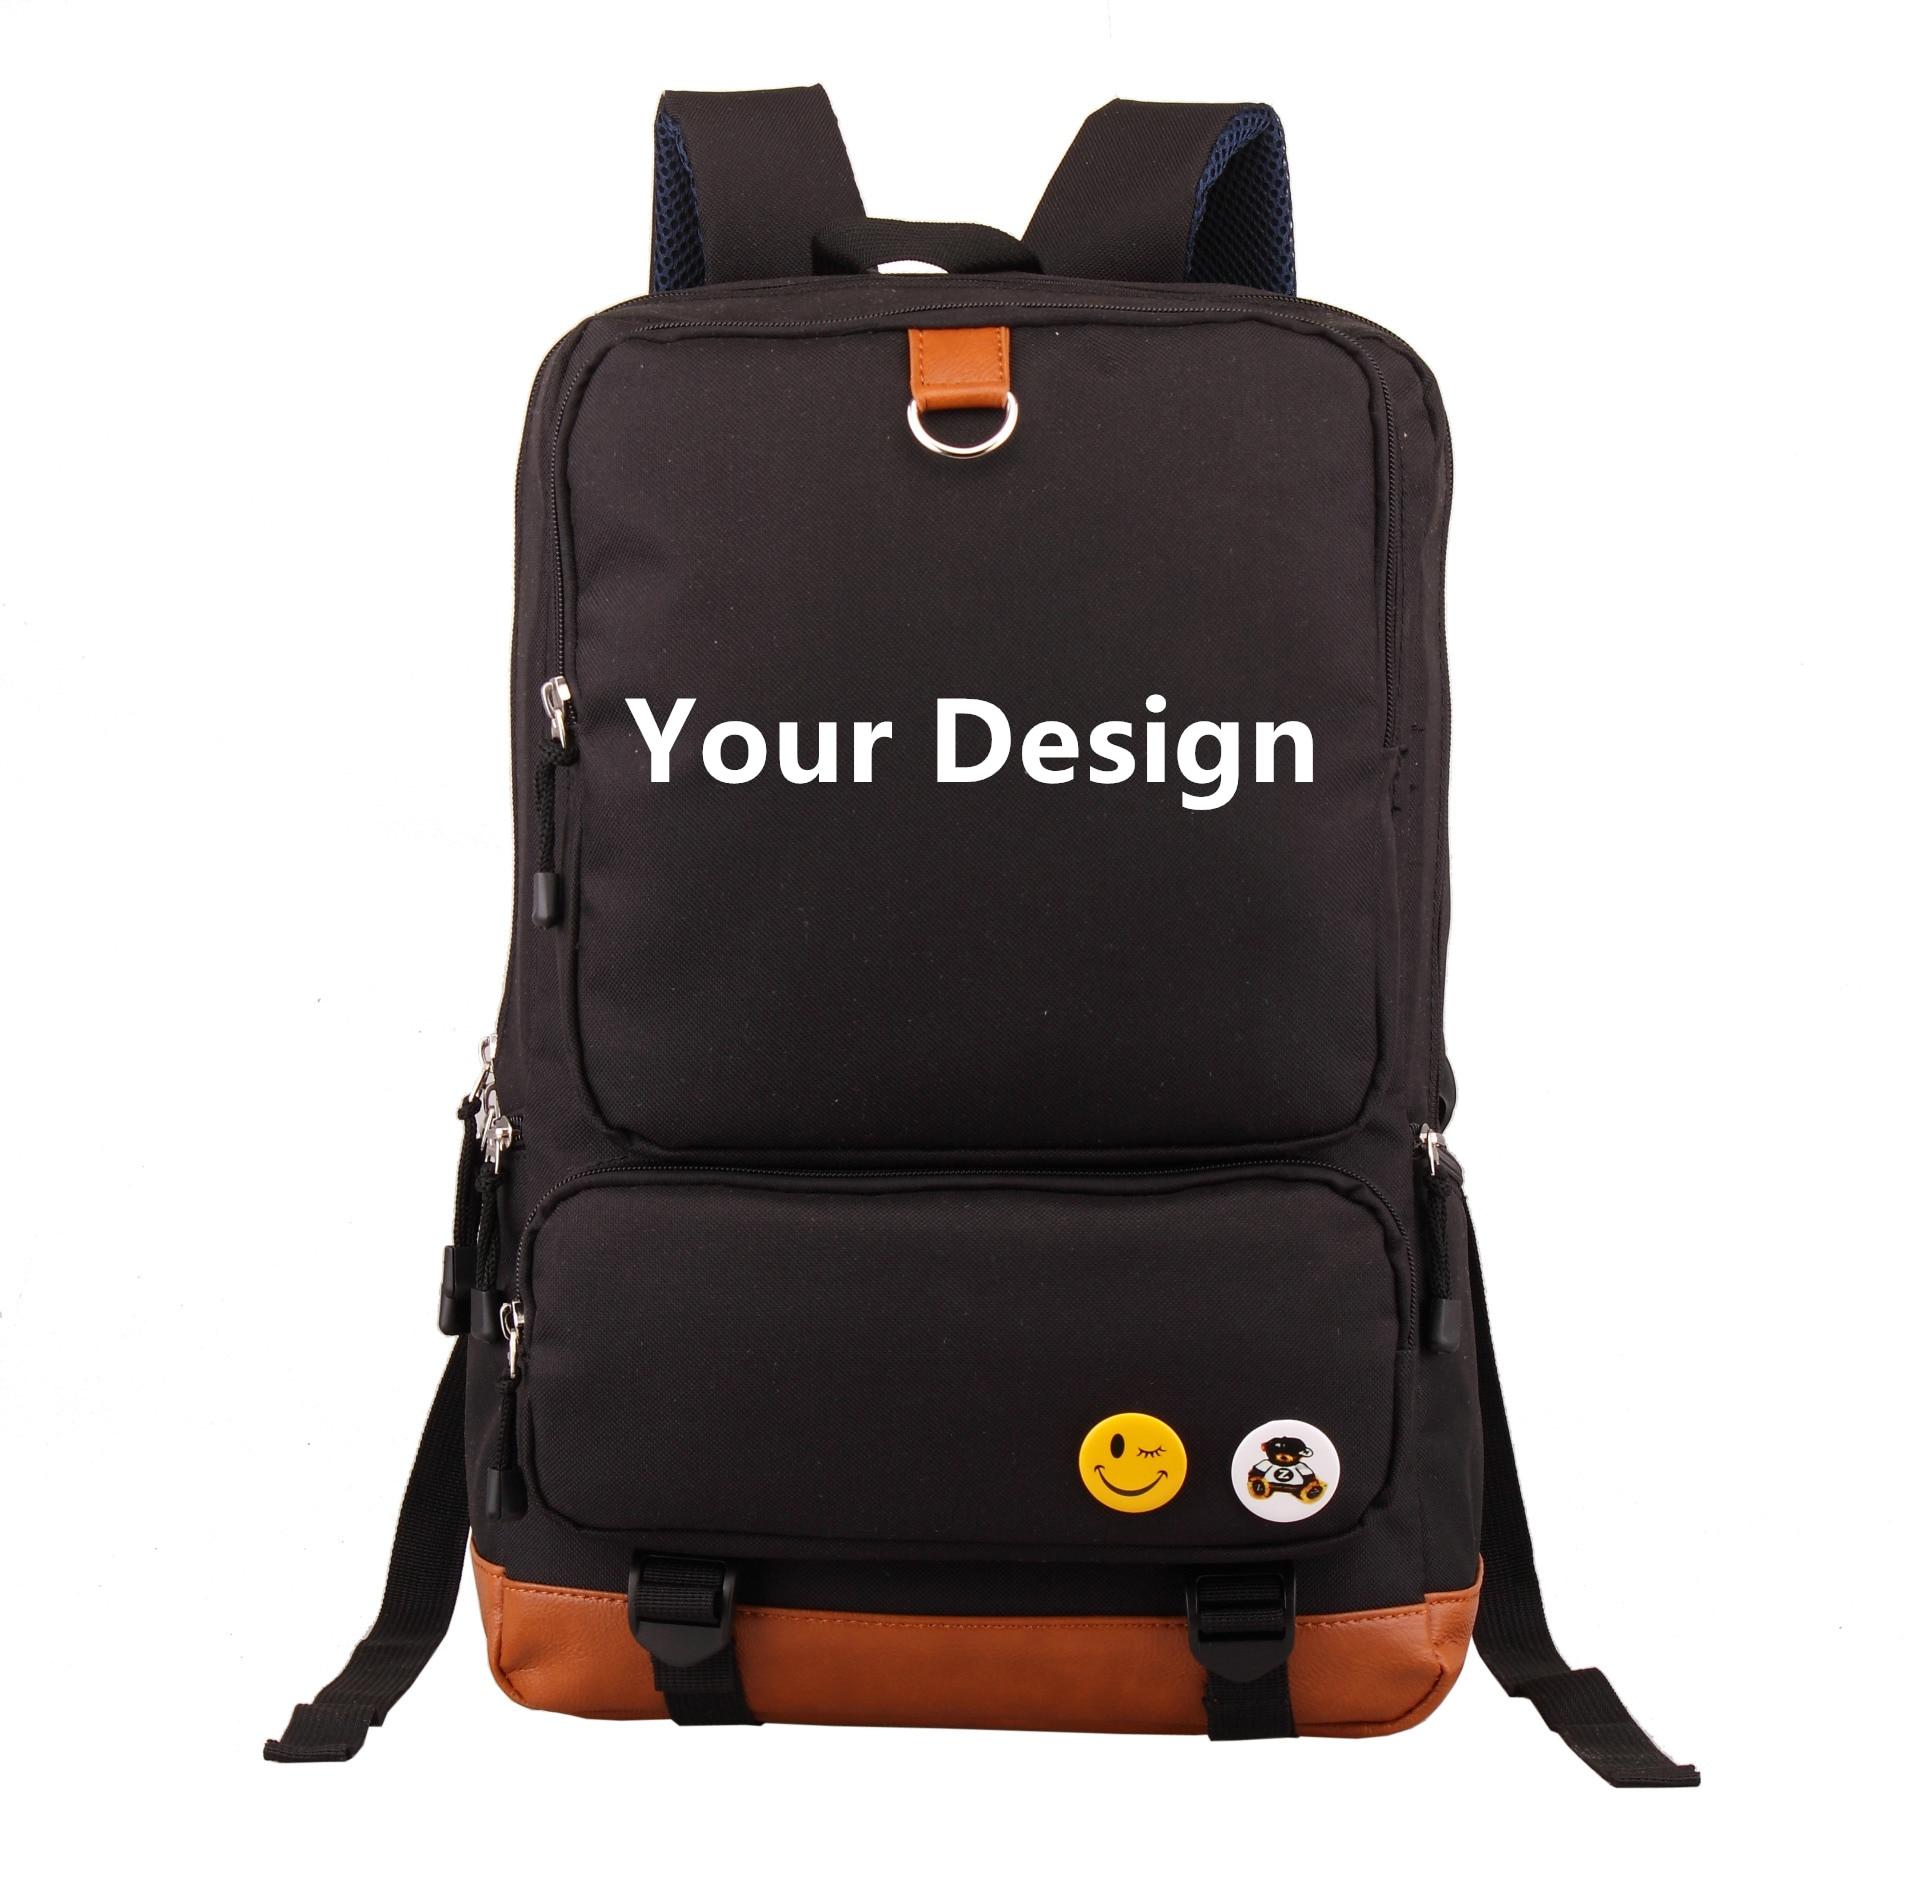 Dropshiping Angepasst Design Oxford Reise Rucksack Mädchen Große Schule Taschen Studenten Bookbag USB Laptop Rucksack